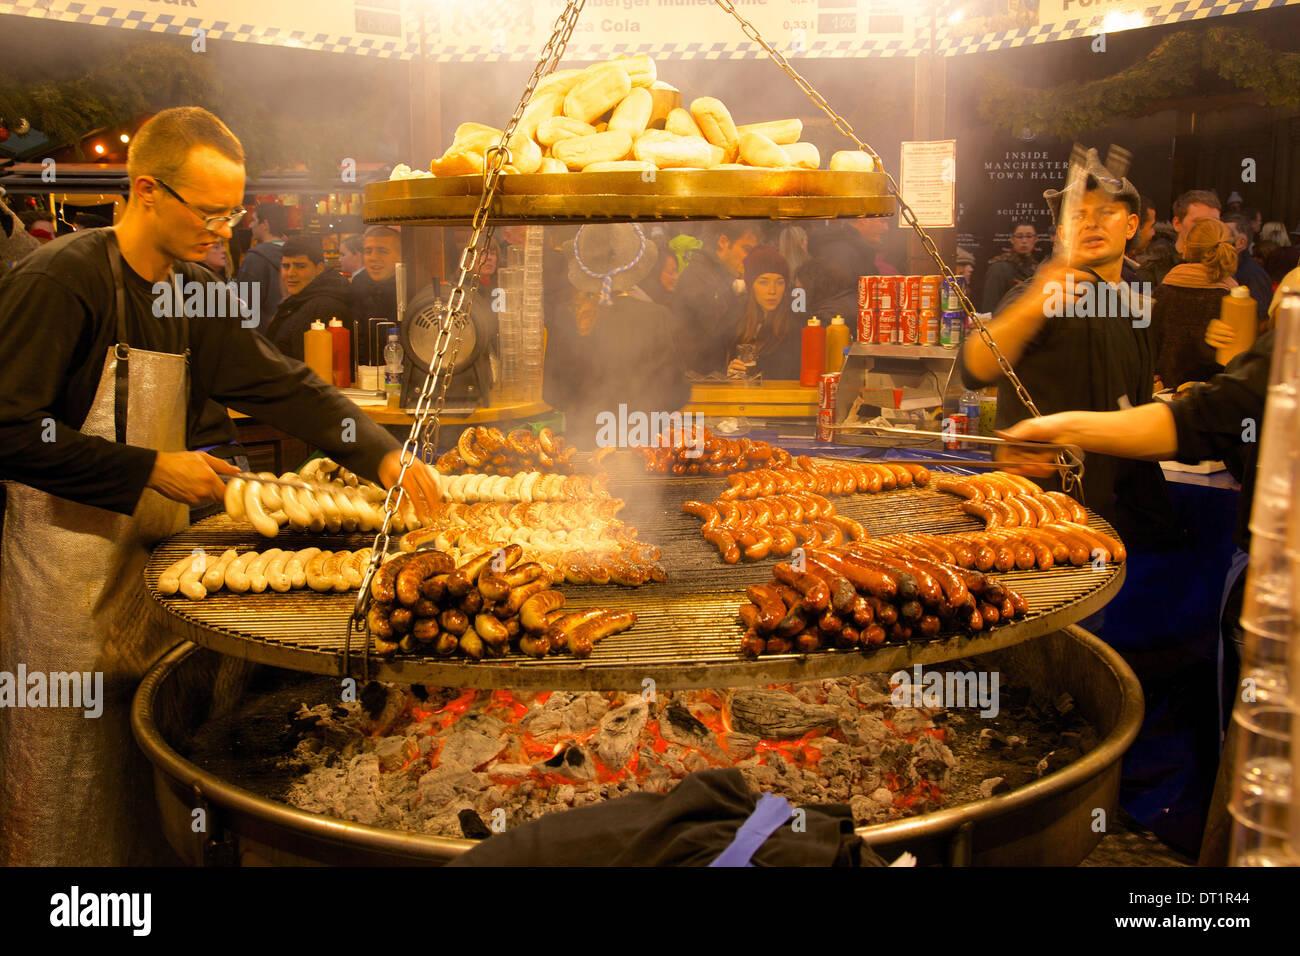 Hot dog stand, Christmas Market, Albert Square, Manchester, England, United Kingdom, Europe - Stock Image